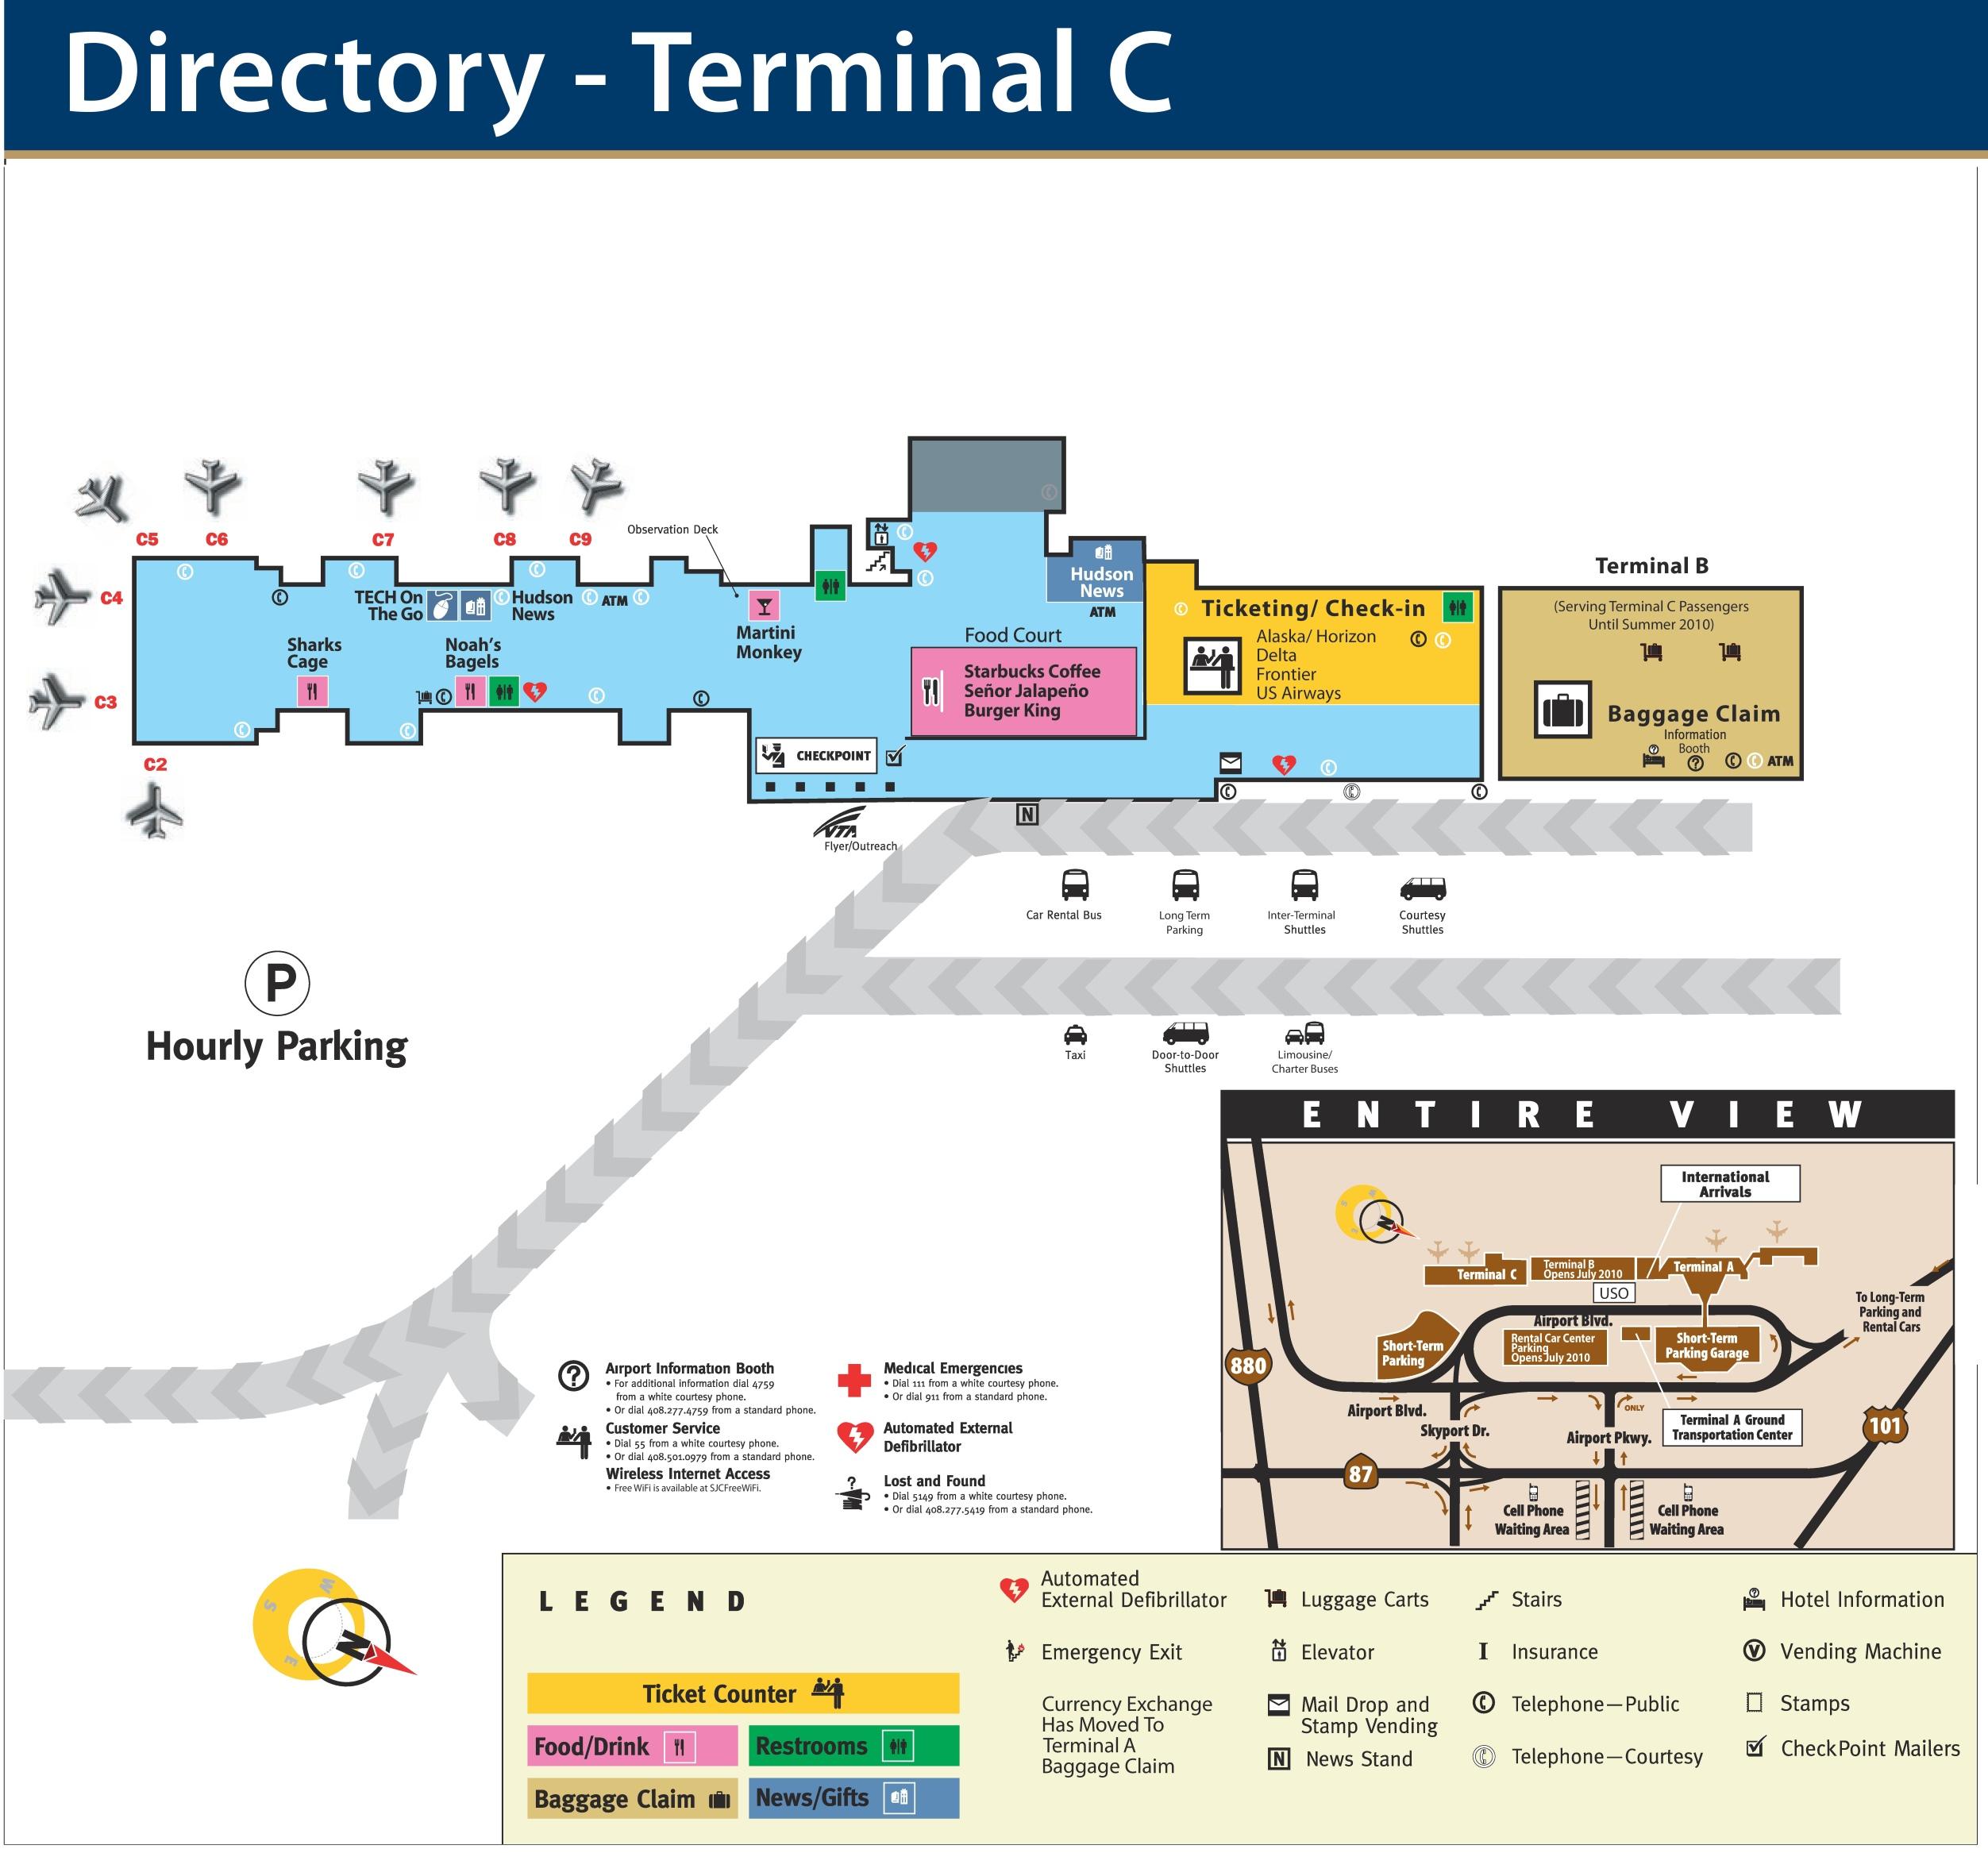 Denver Airport Terminal C Map San Jose airport terminal C map Denver Airport Terminal C Map